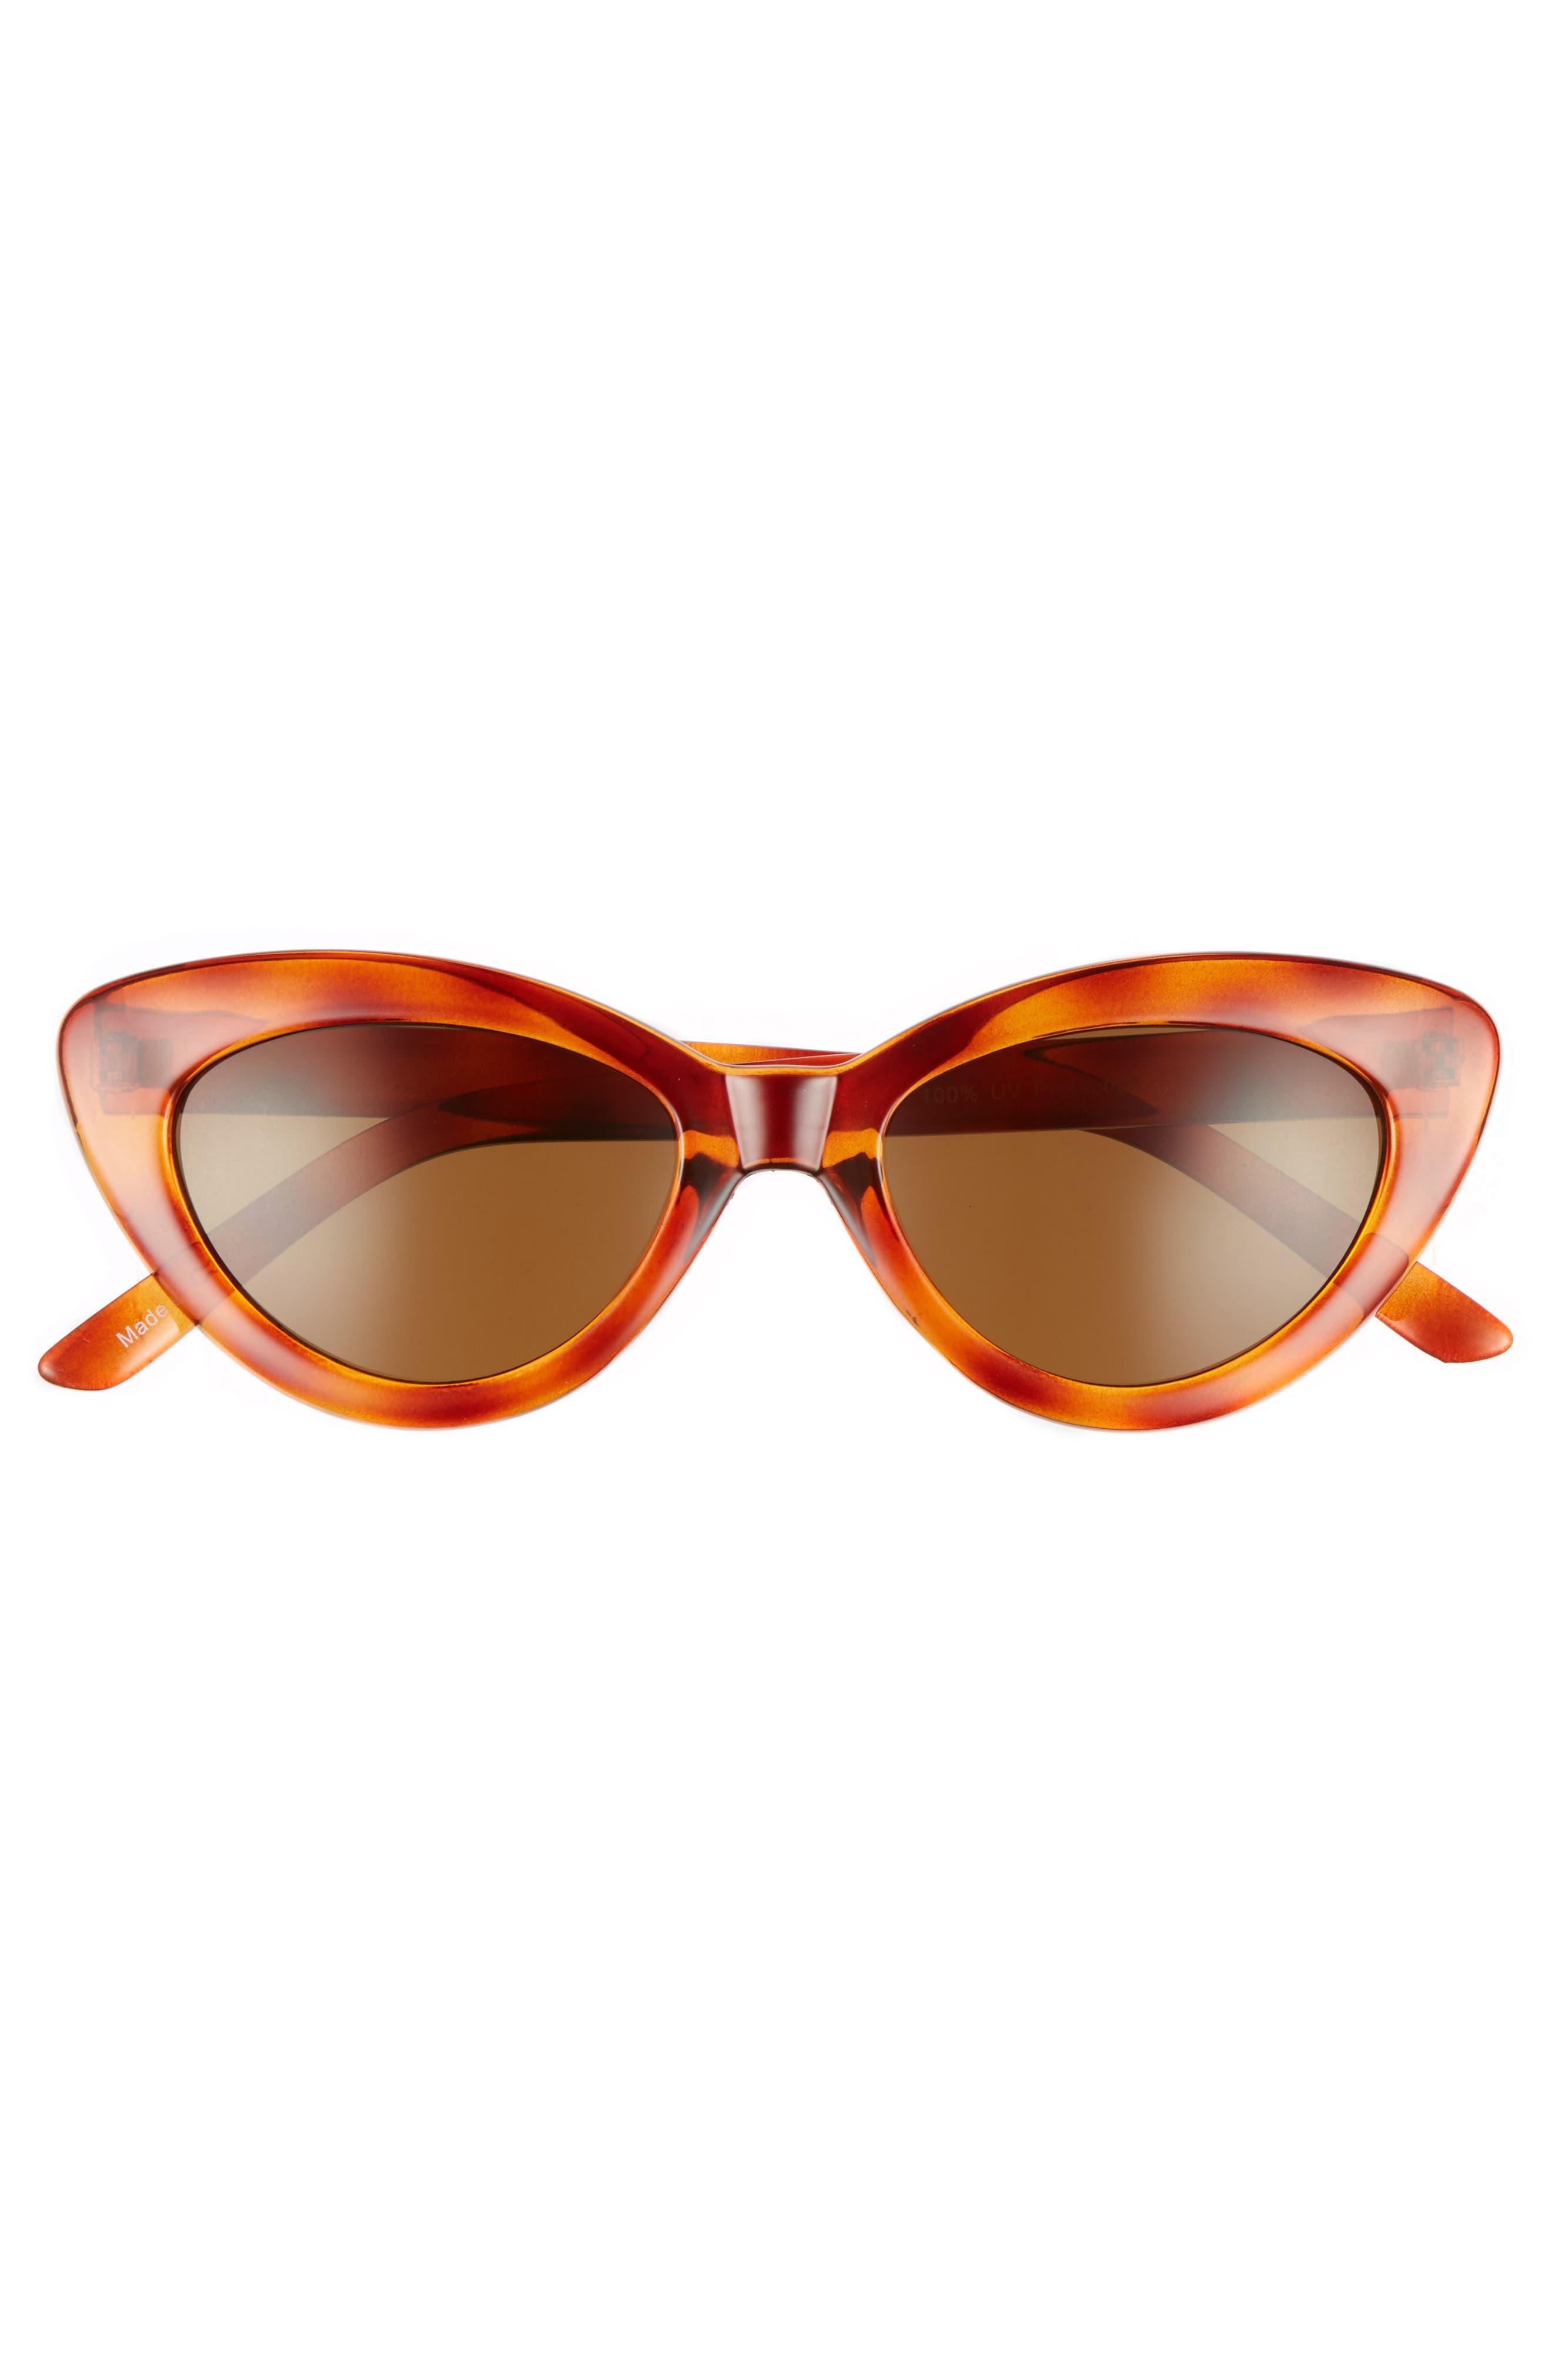 51mm Mini Cat Eye Sunglasses,                             Alternate thumbnail 3, color,                             Tort